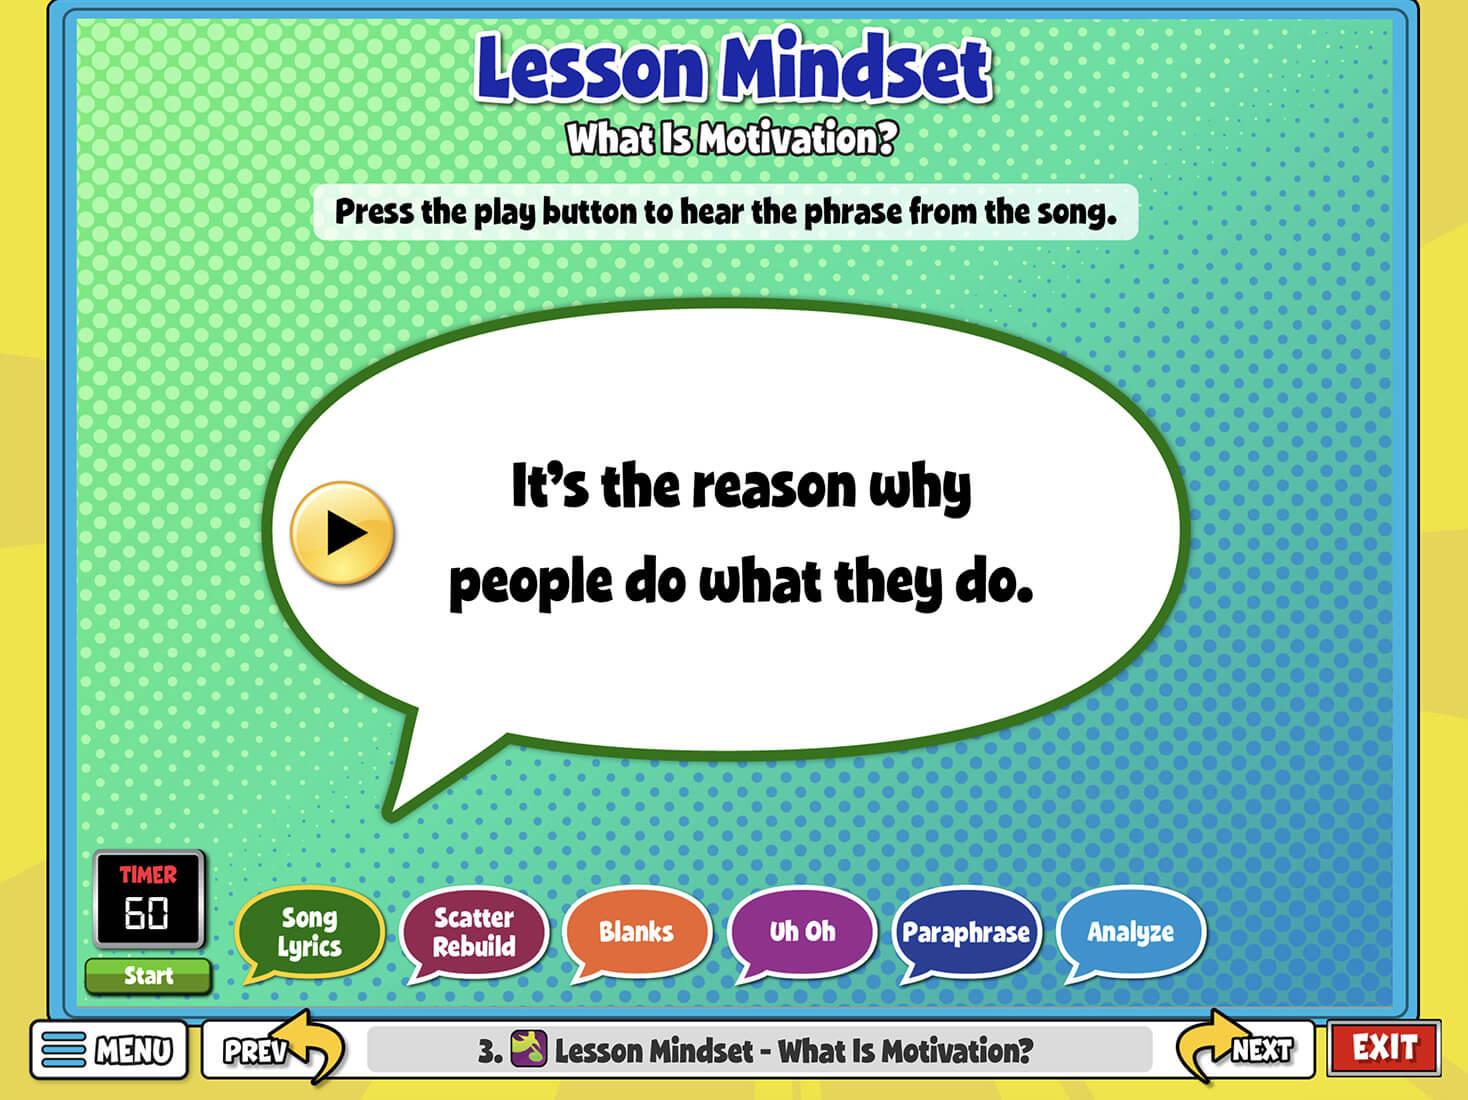 3. Lesson Mindset